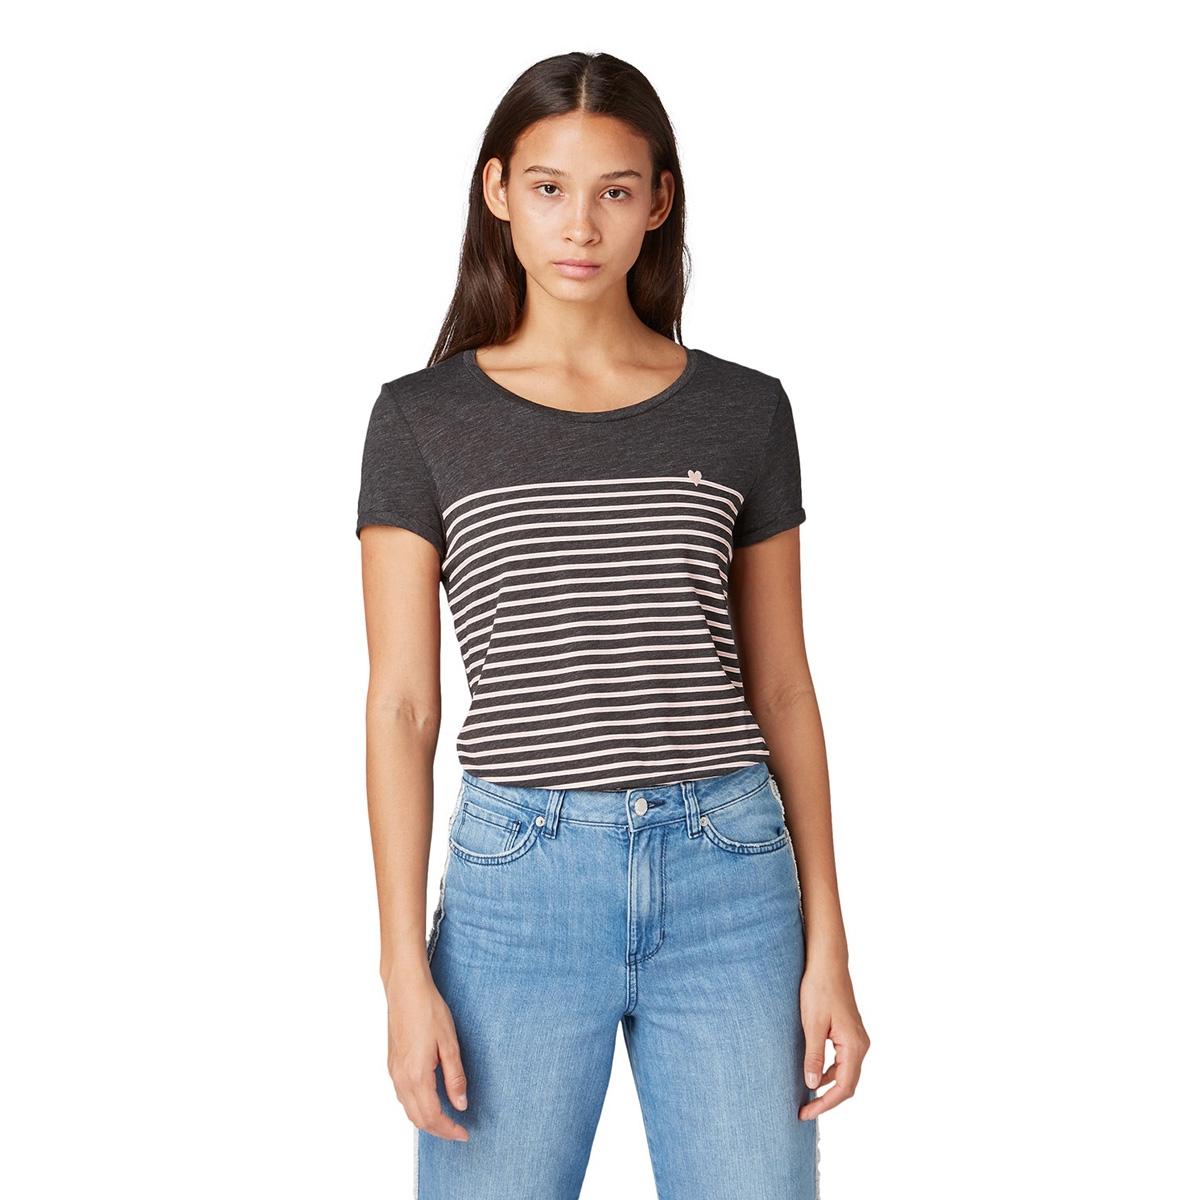 t shirt met streep patroon 1012686xx71 tom tailor t-shirt 19022